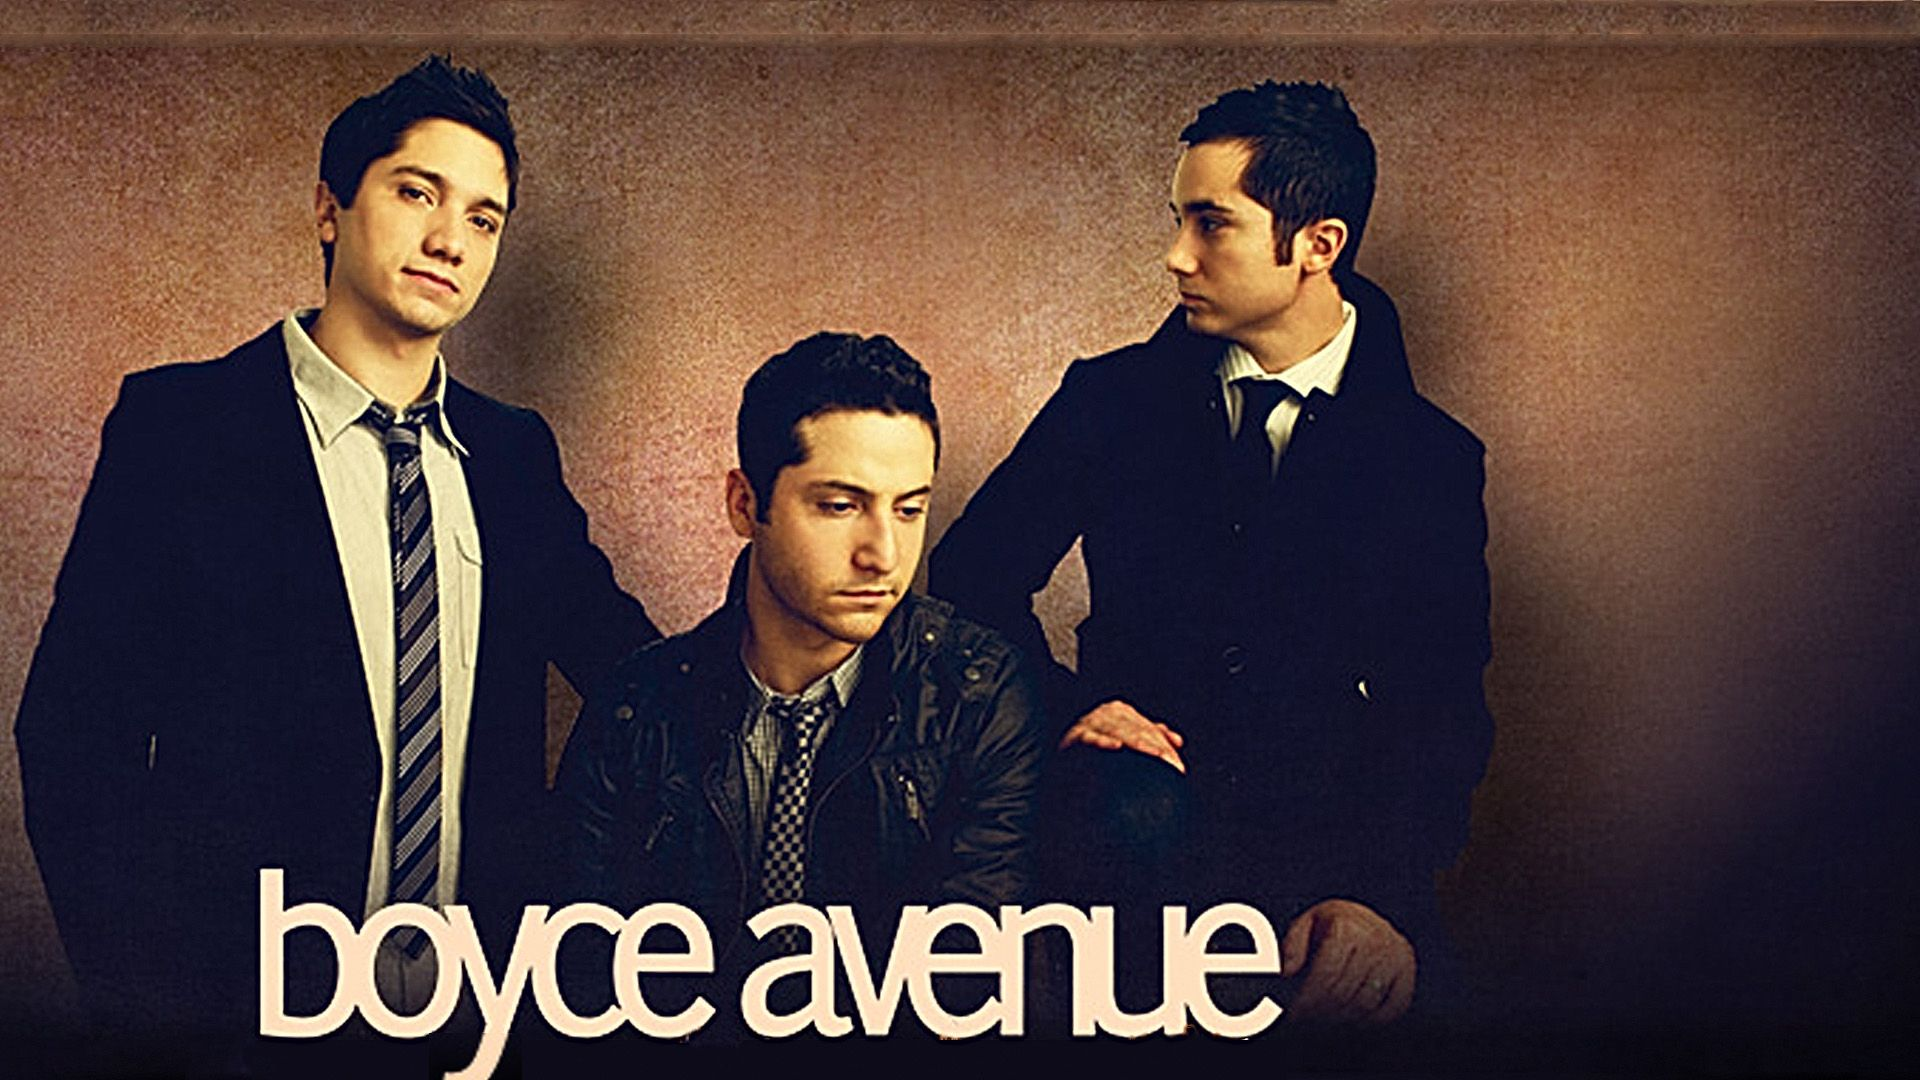 Boyce Avenue: The Internet's Best Kept Secret Band | The Buzz by Mike Schaffer